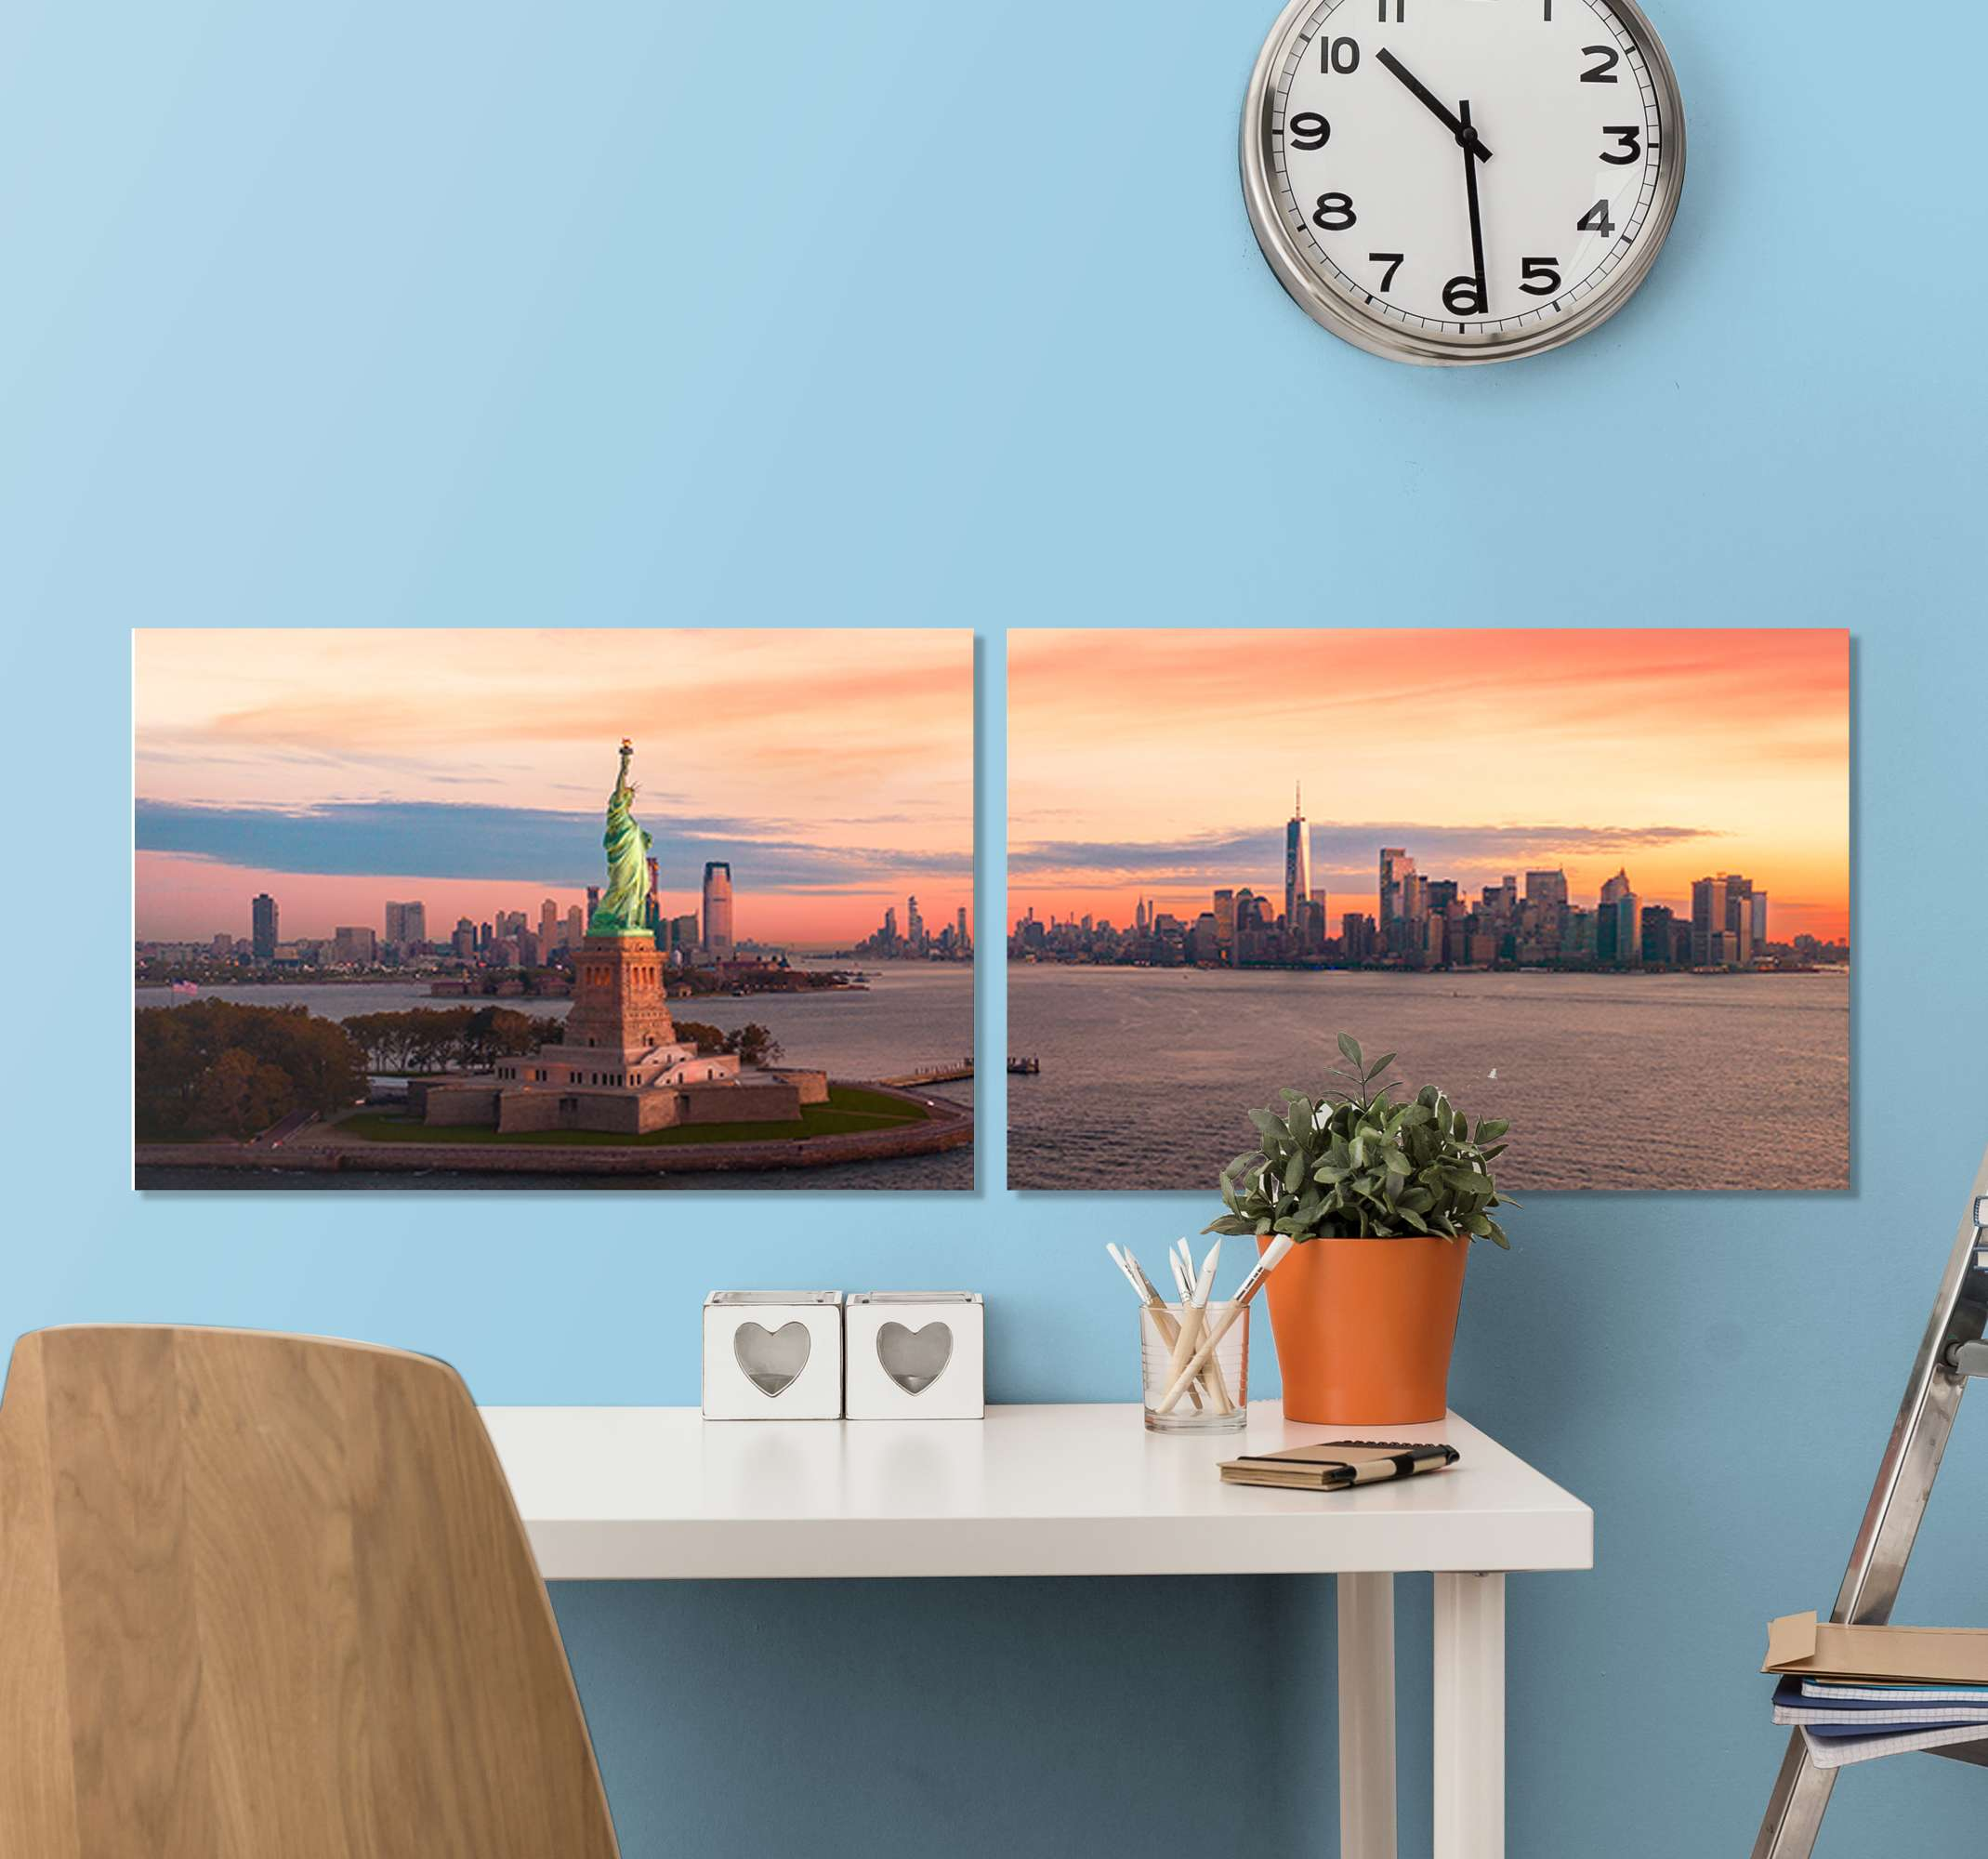 TenStickers. 뉴욕 마스터 침실 캔버스 벽 예술. 아름다운 뉴욕시의 스카이 라인 캔버스를 두 개의 캔버스로 만들어 집, 사무실, 라운지, 방문자 방, 비즈니스, 공간 등을 아름답게 꾸며보세요.